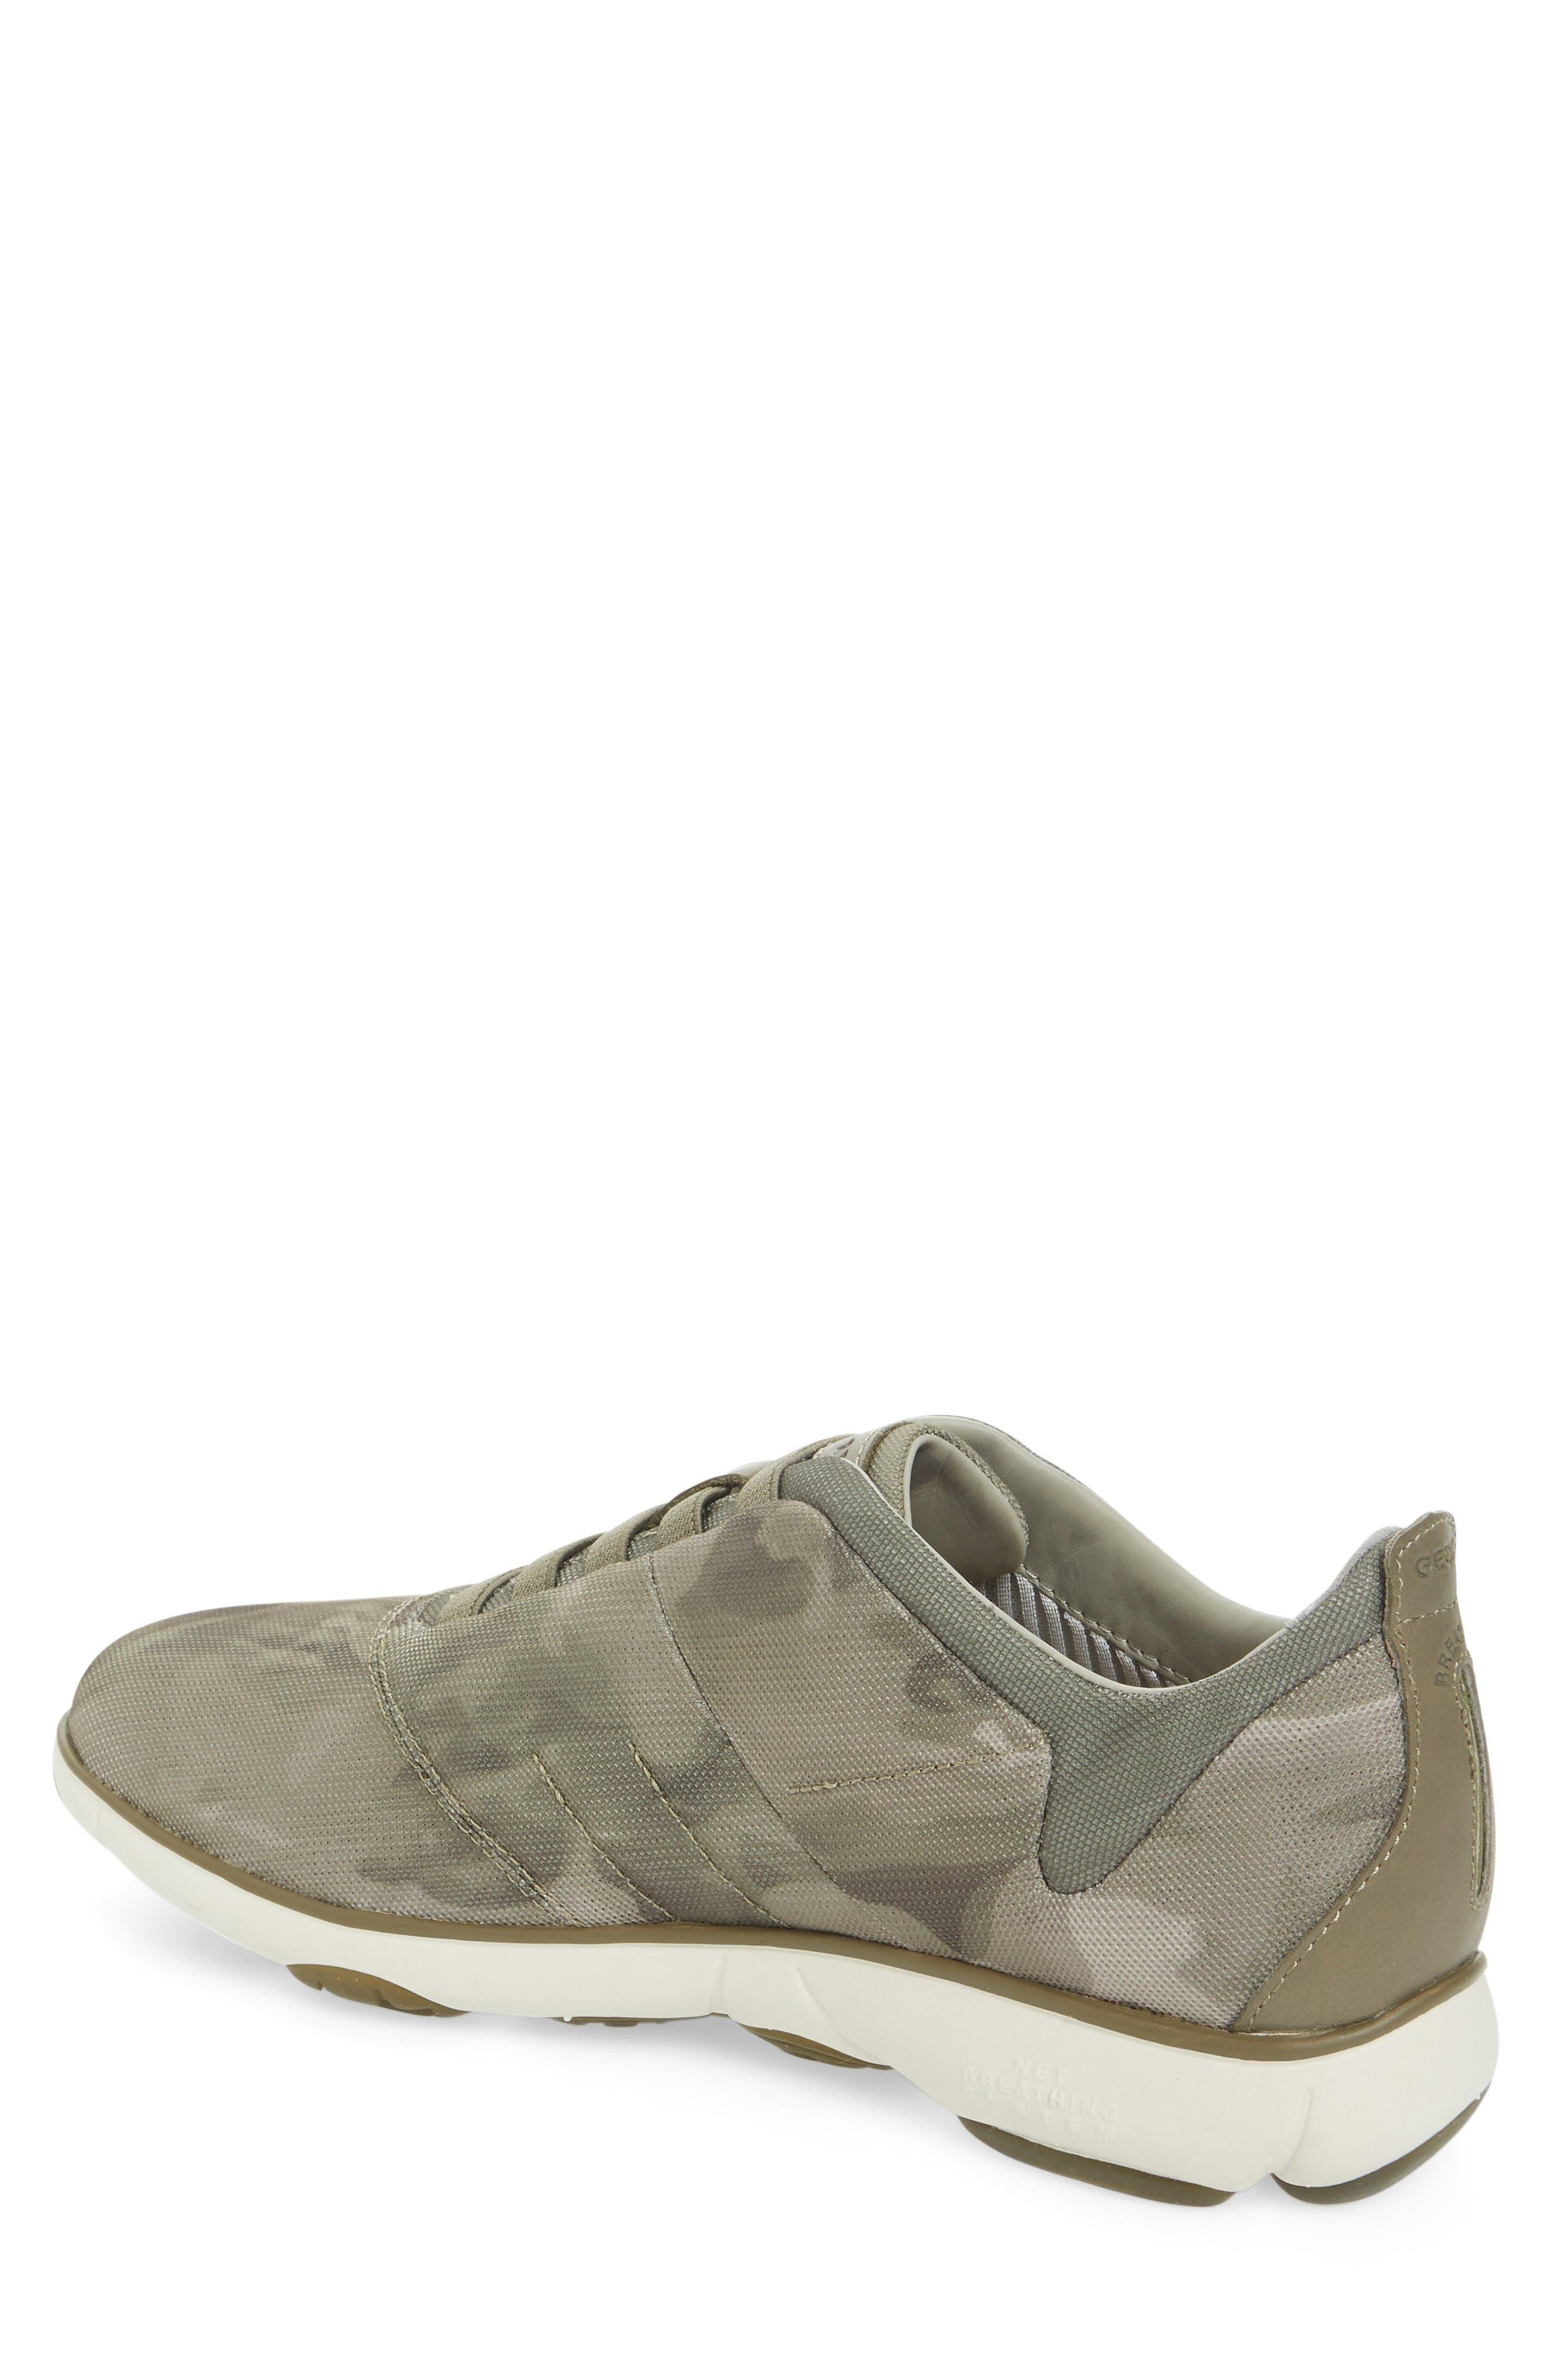 Alternate Image 2  - Geox Nebula 26 Sneaker (Men)